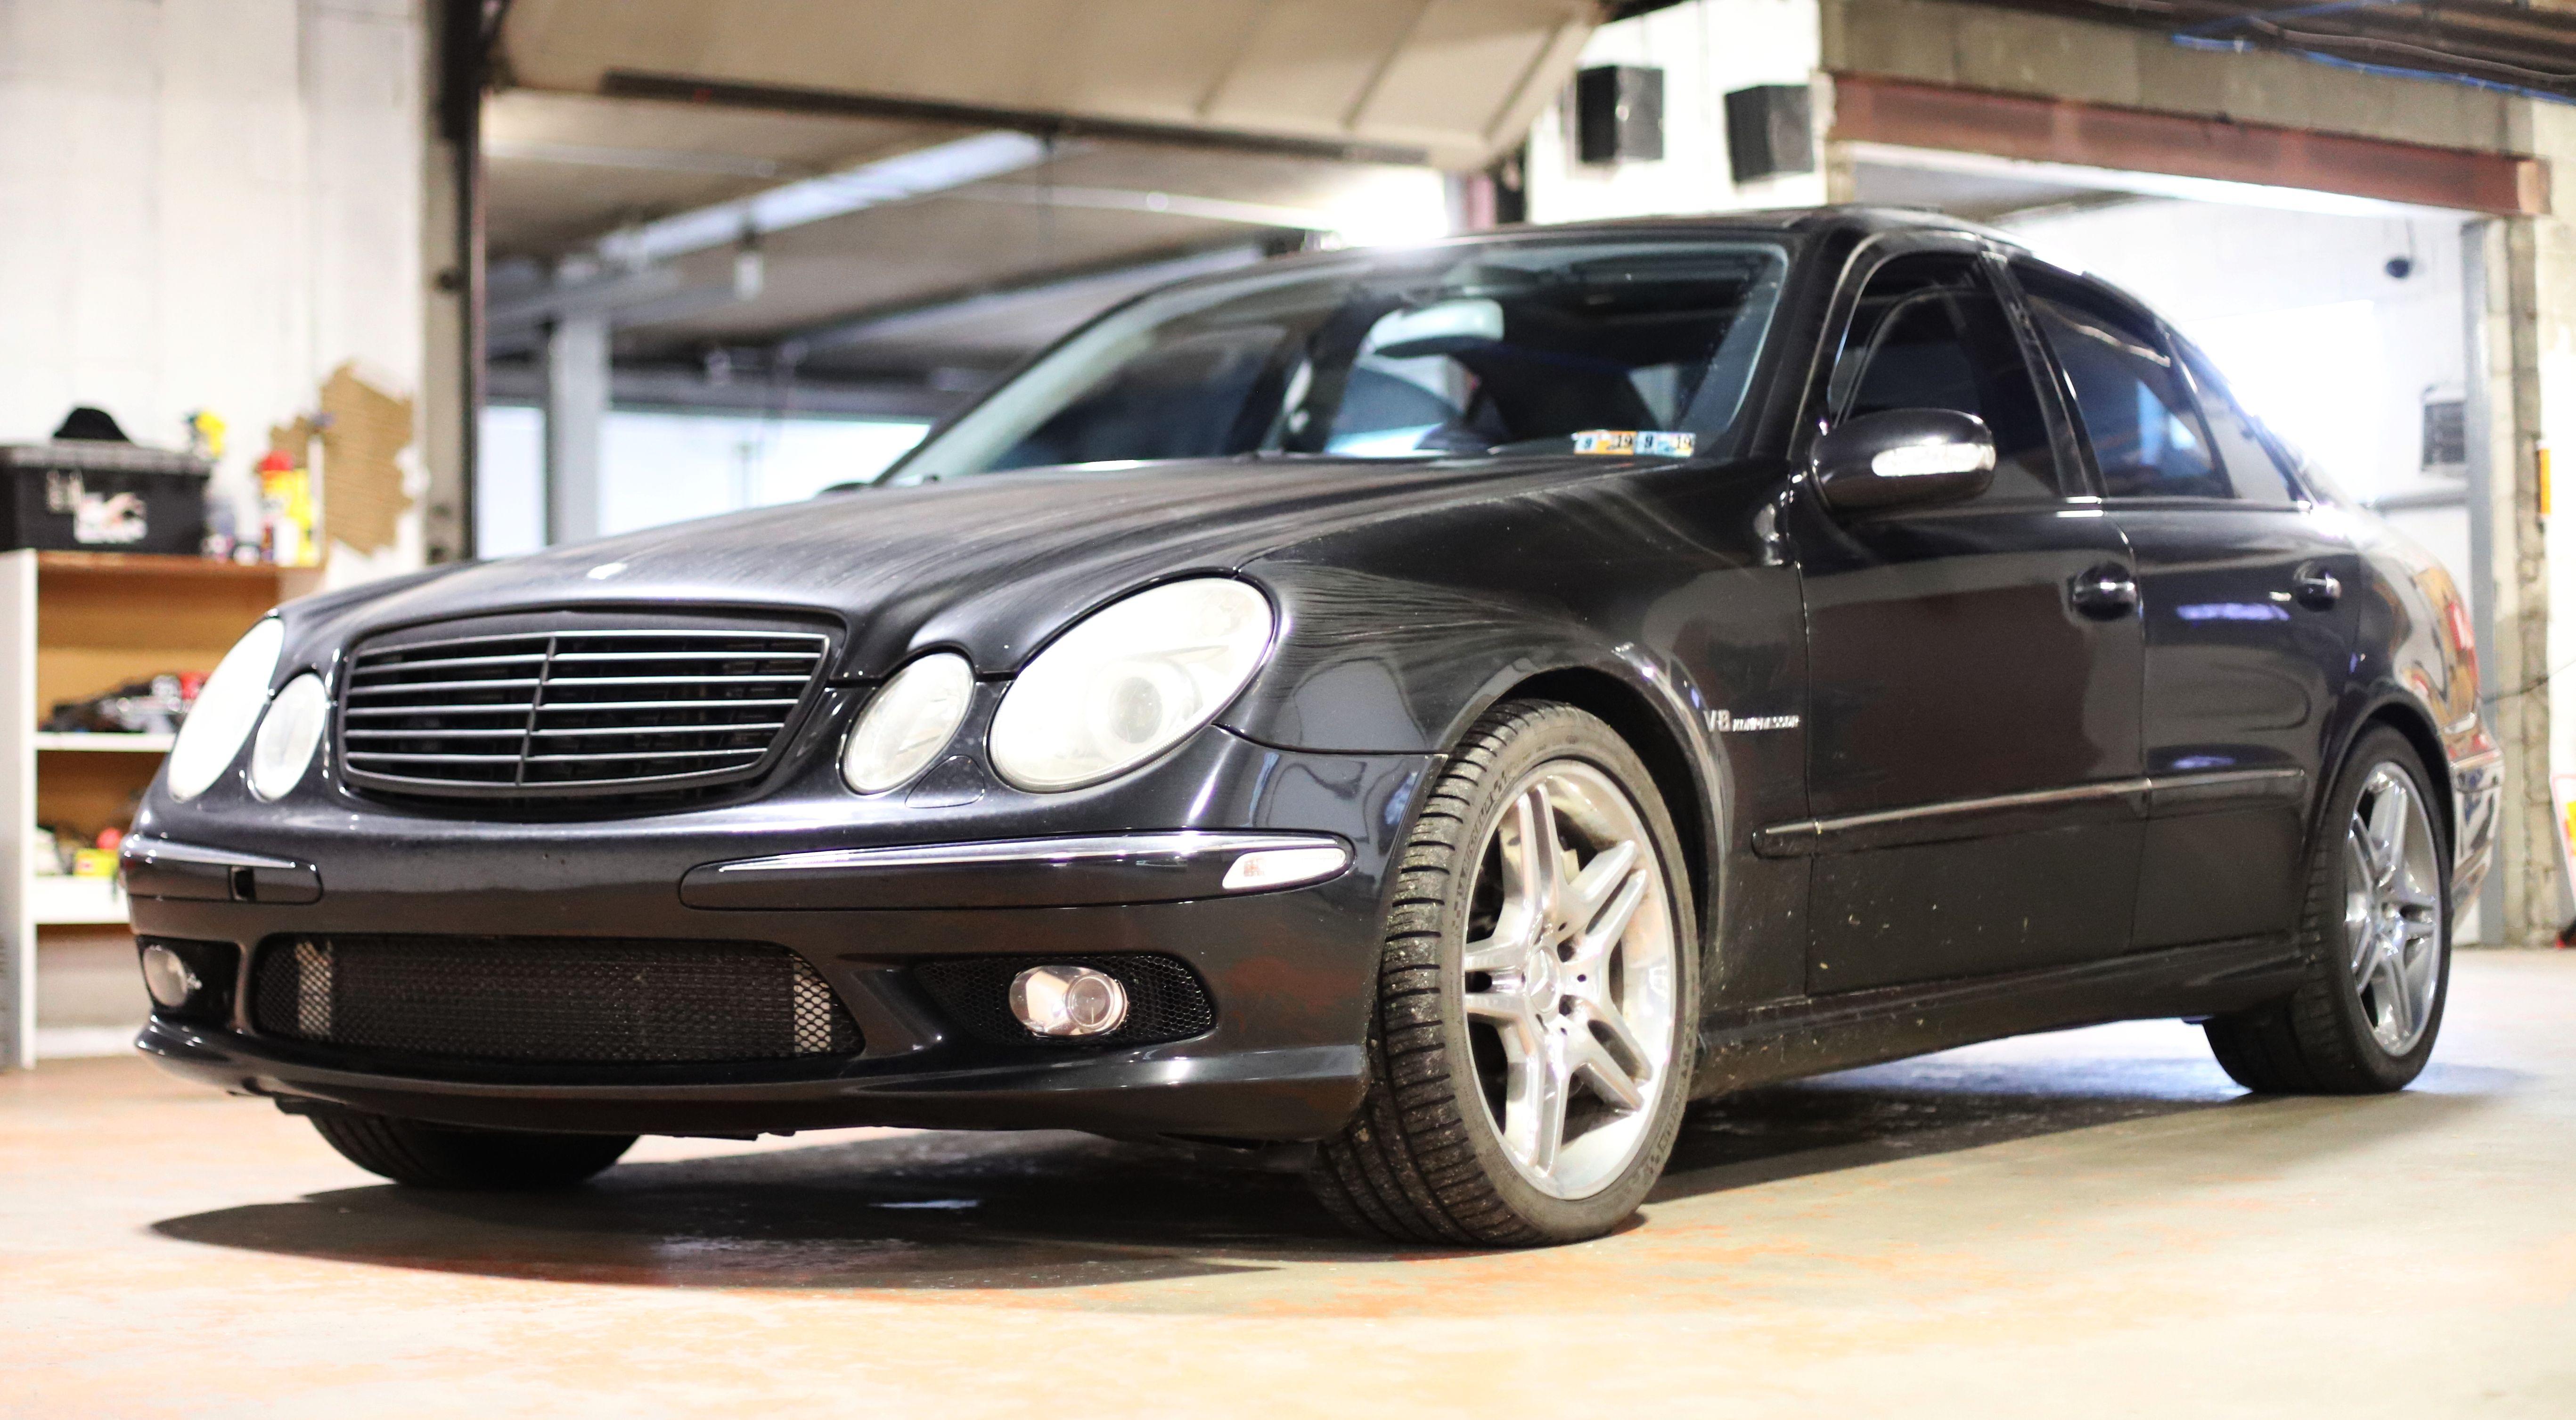 TORQUELIST - 2004 Mercedes-Benz E55 AMG